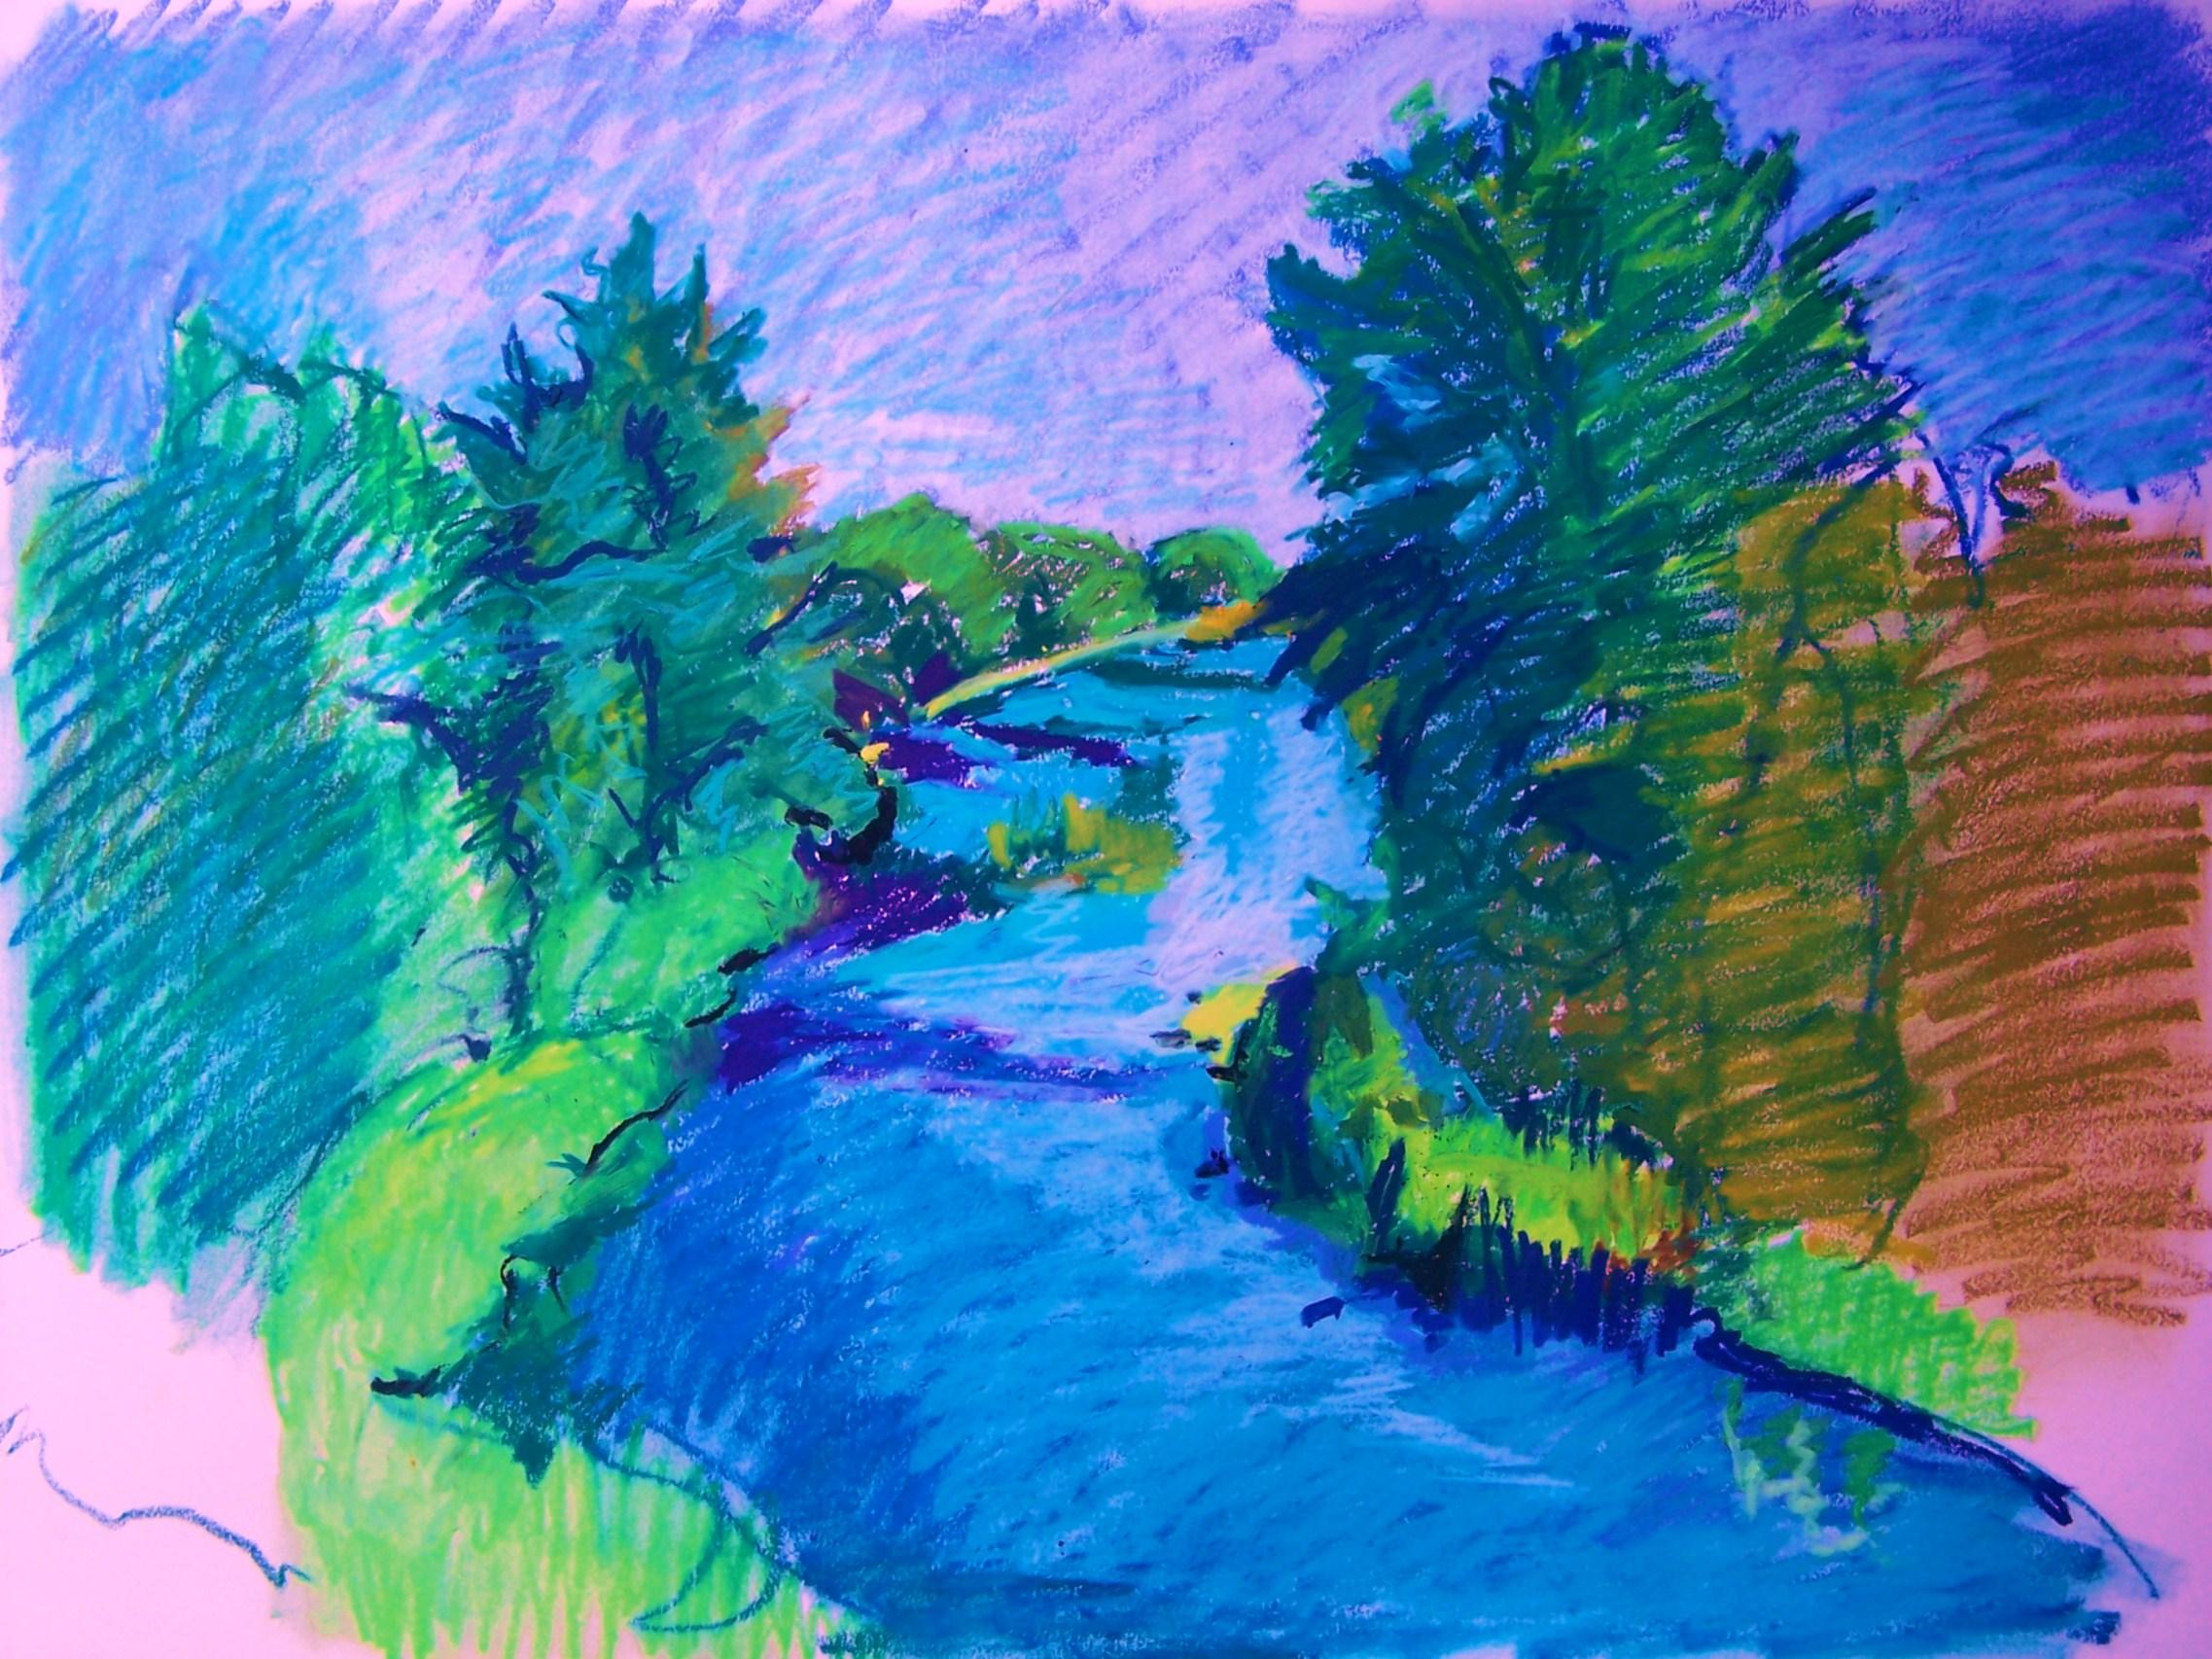 Drawn river oil pastel The Weblog river Flowing Kuschan's